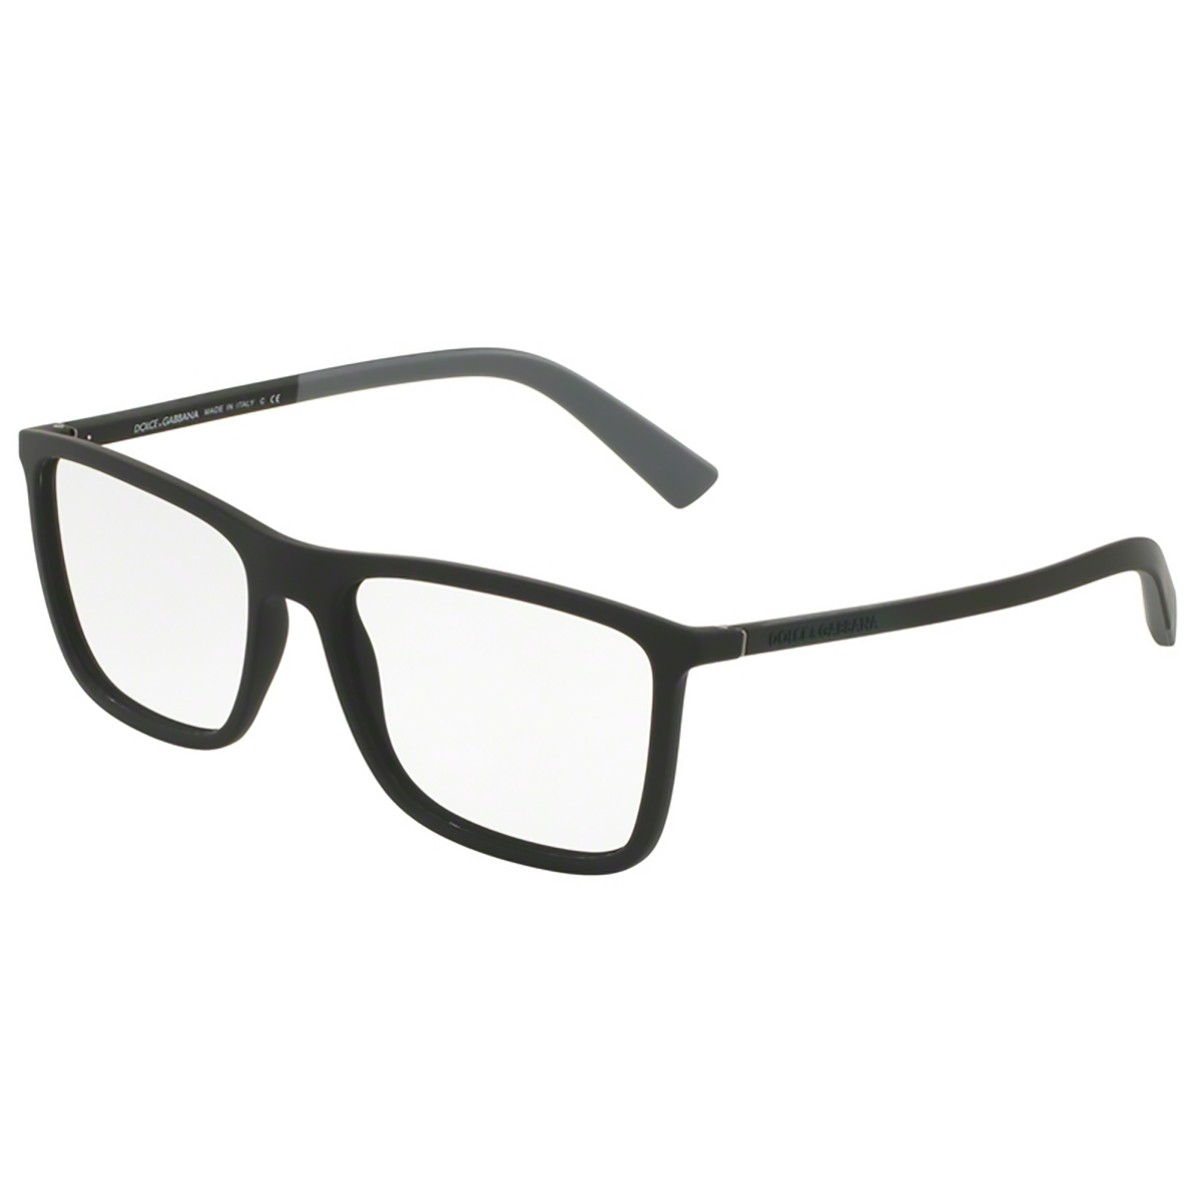 Óculos de grau   dolce & gabbana   masculino